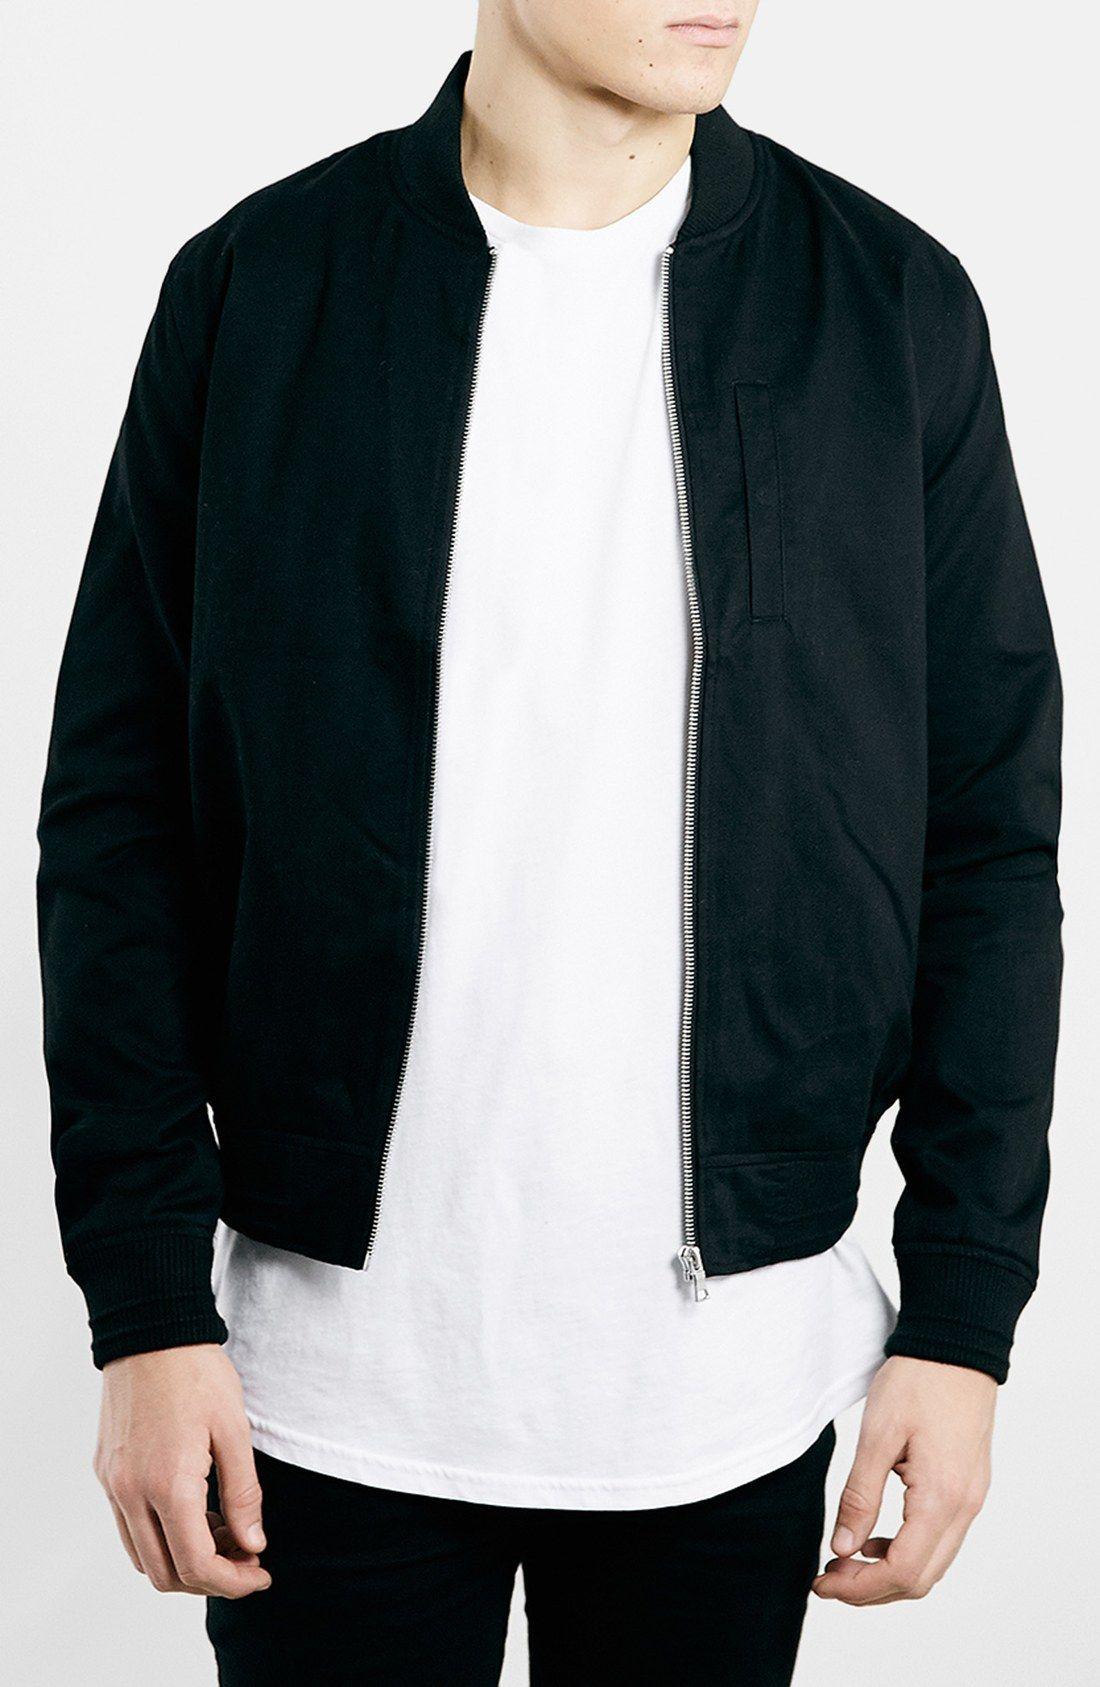 Topman Black Cotton Bomber Jacket | Wardrobe | Pinterest | Man style